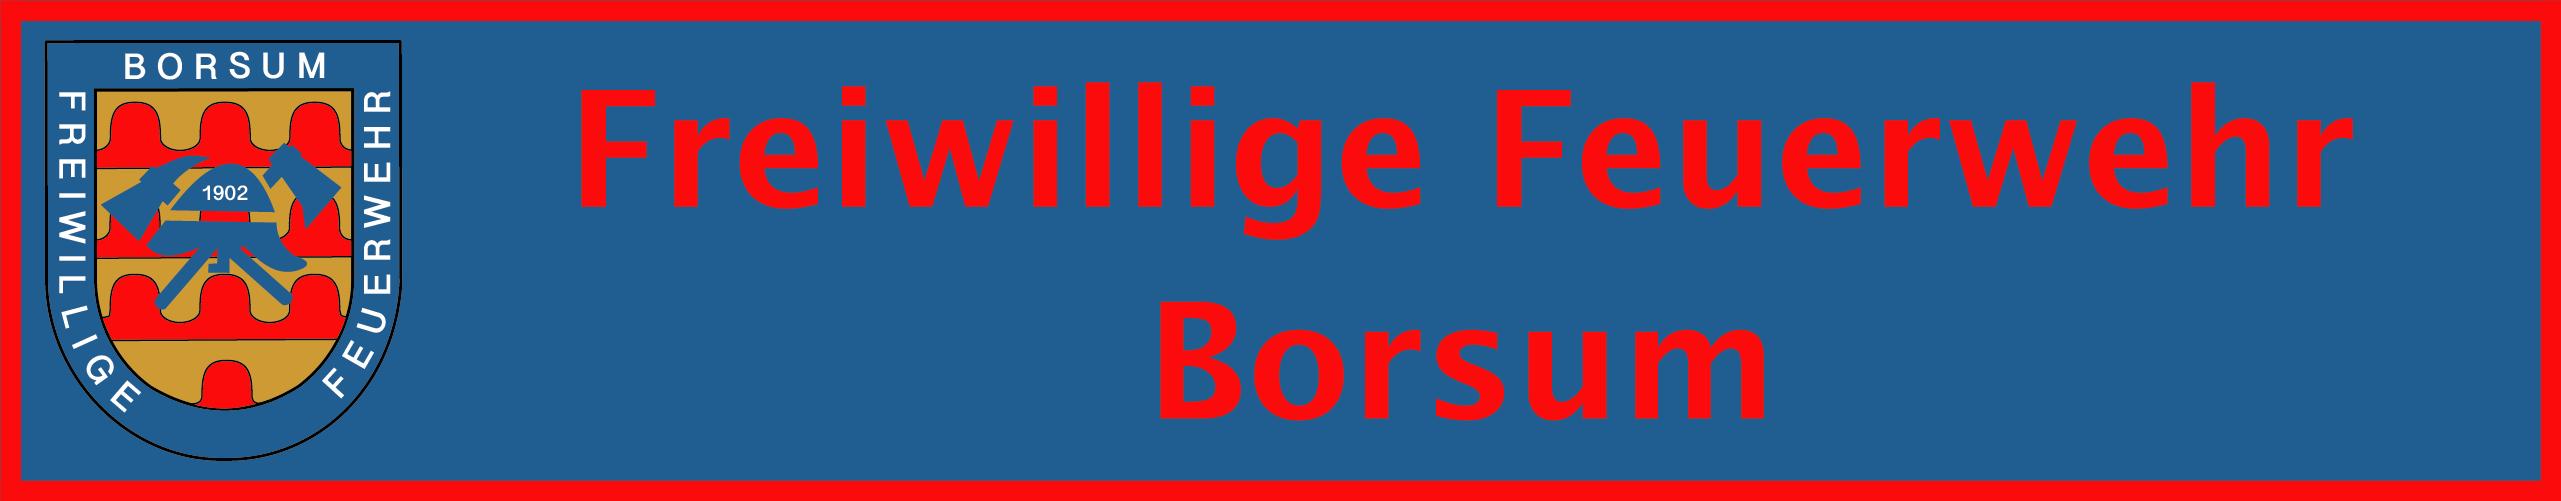 Feuerwehr Borsum